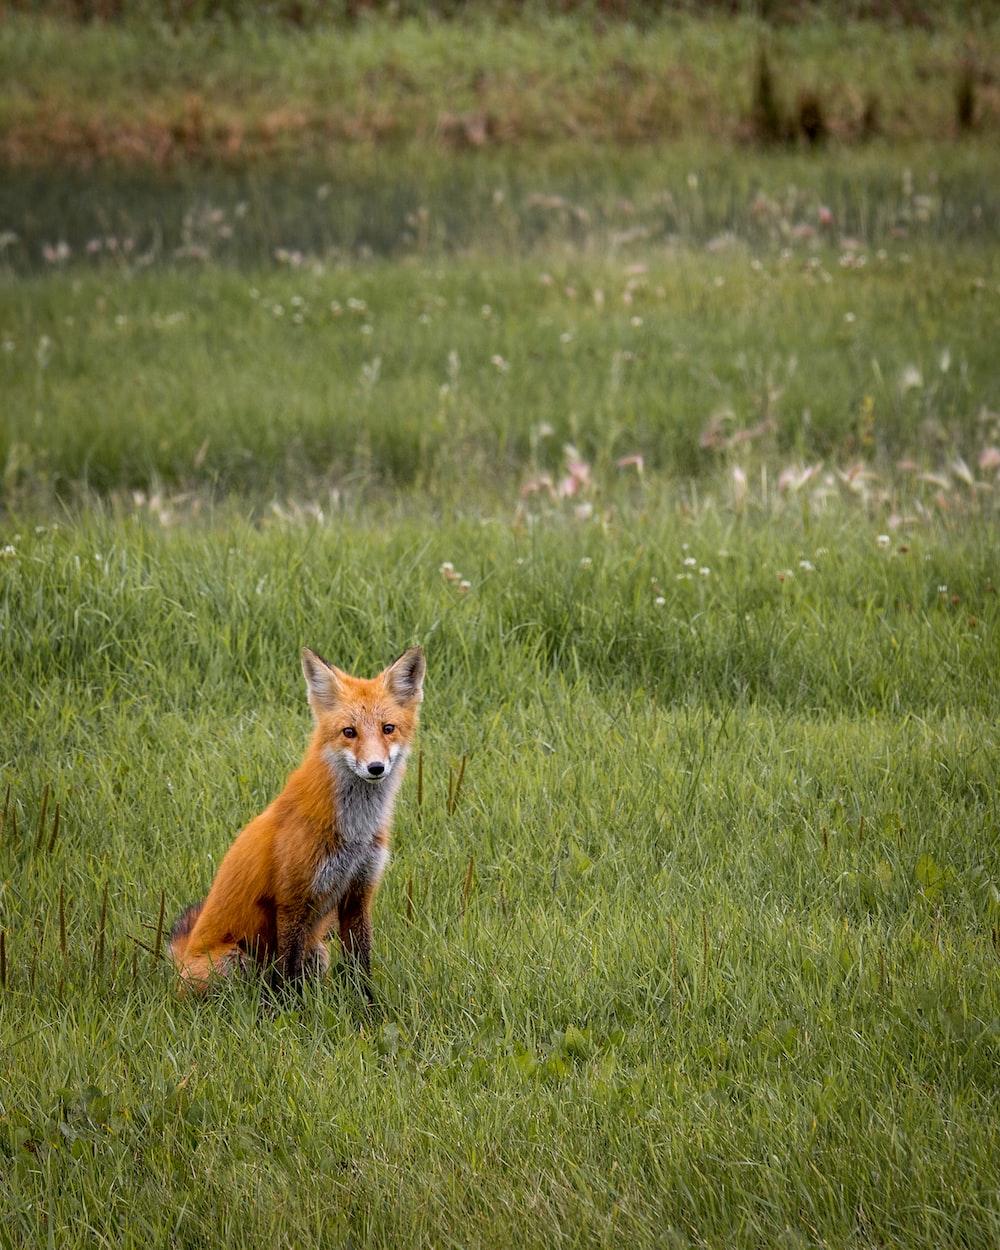 red fox sitting in green grass field